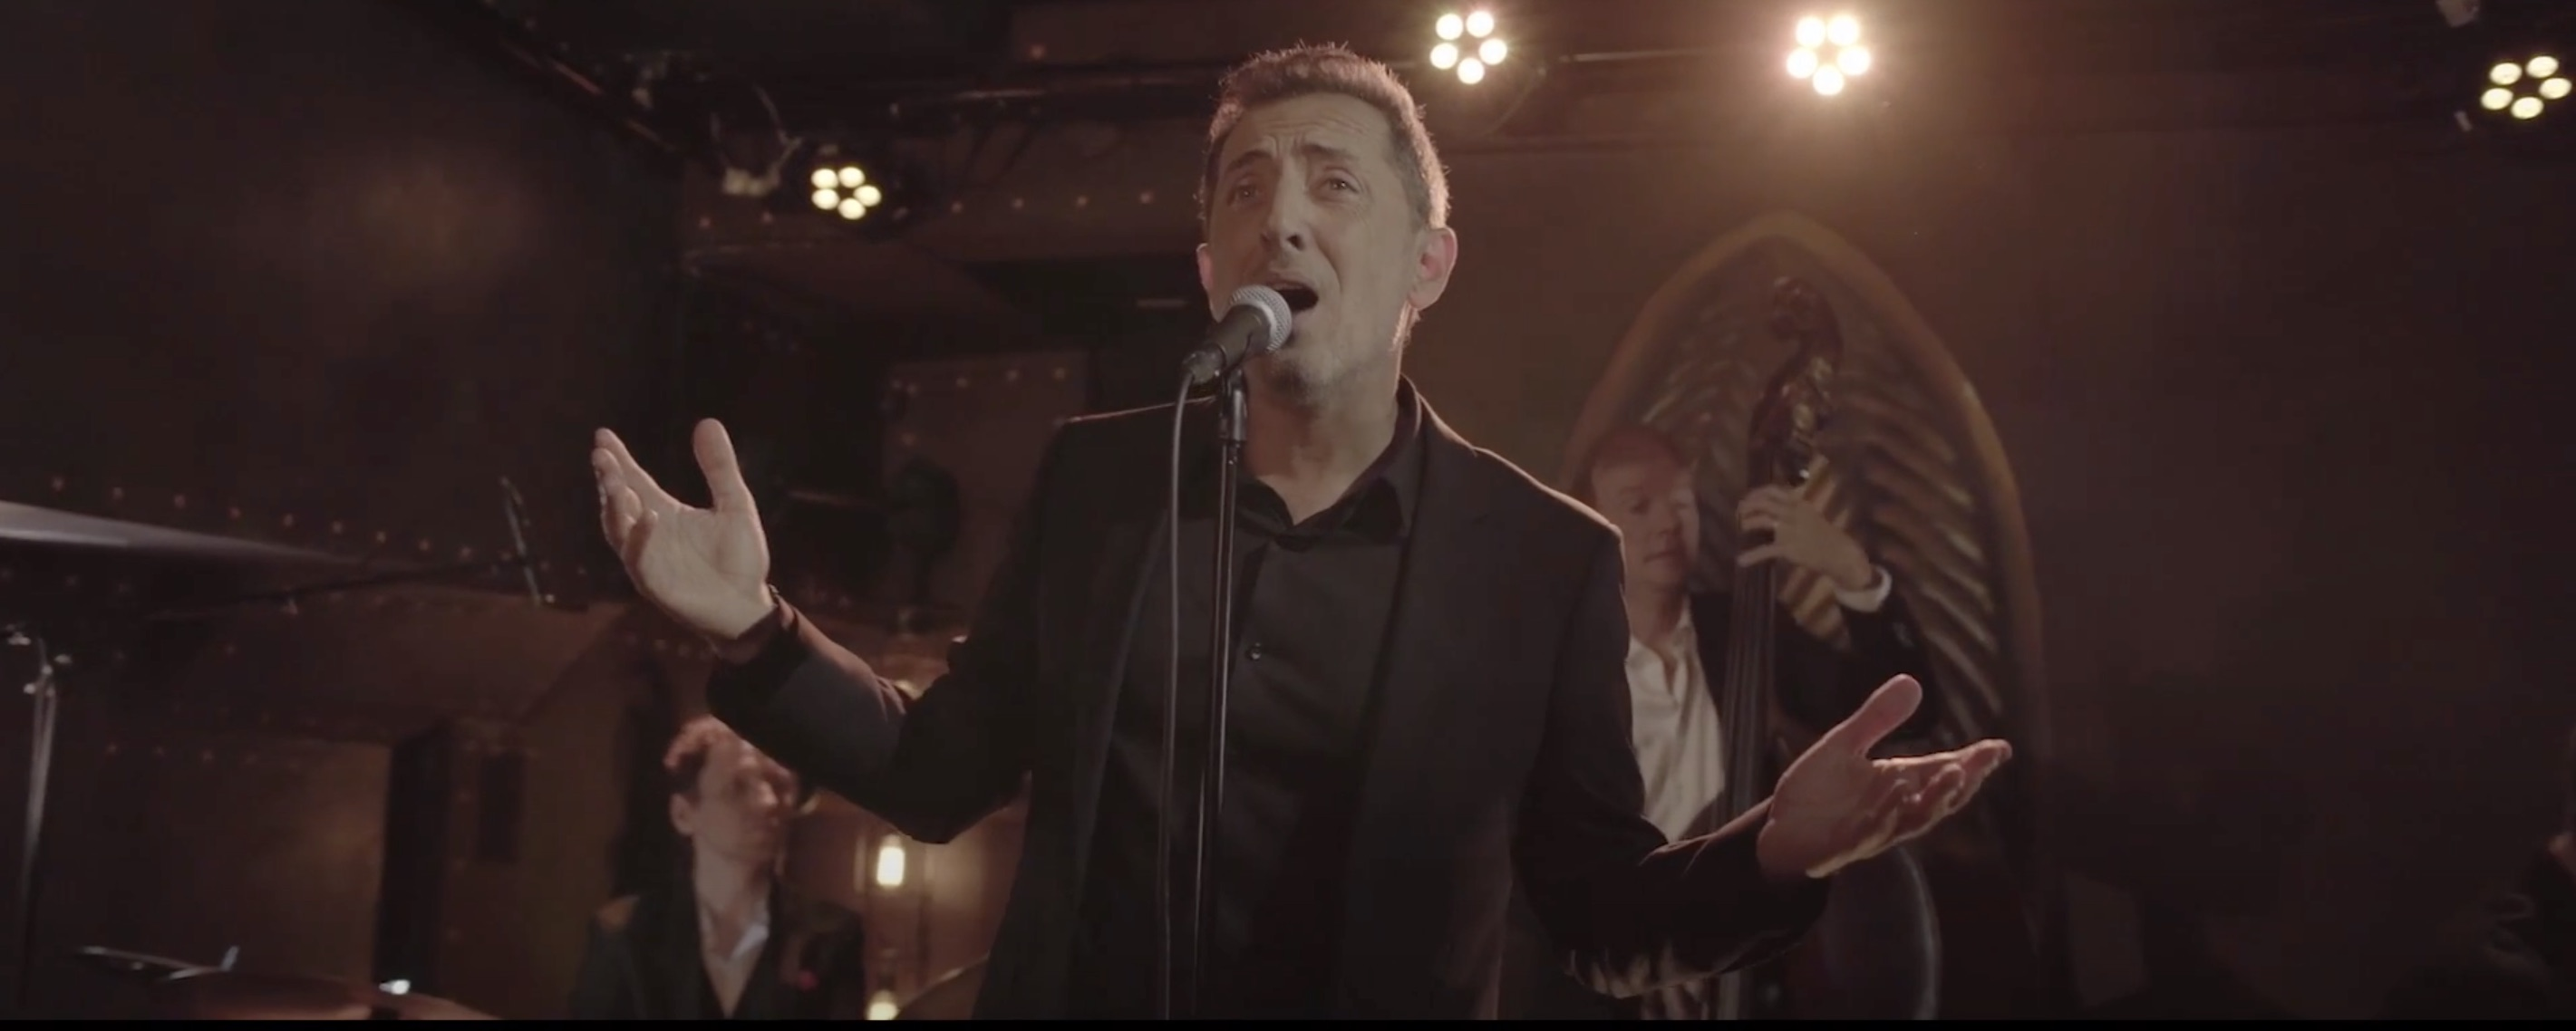 Gad Elmaleh - chanson